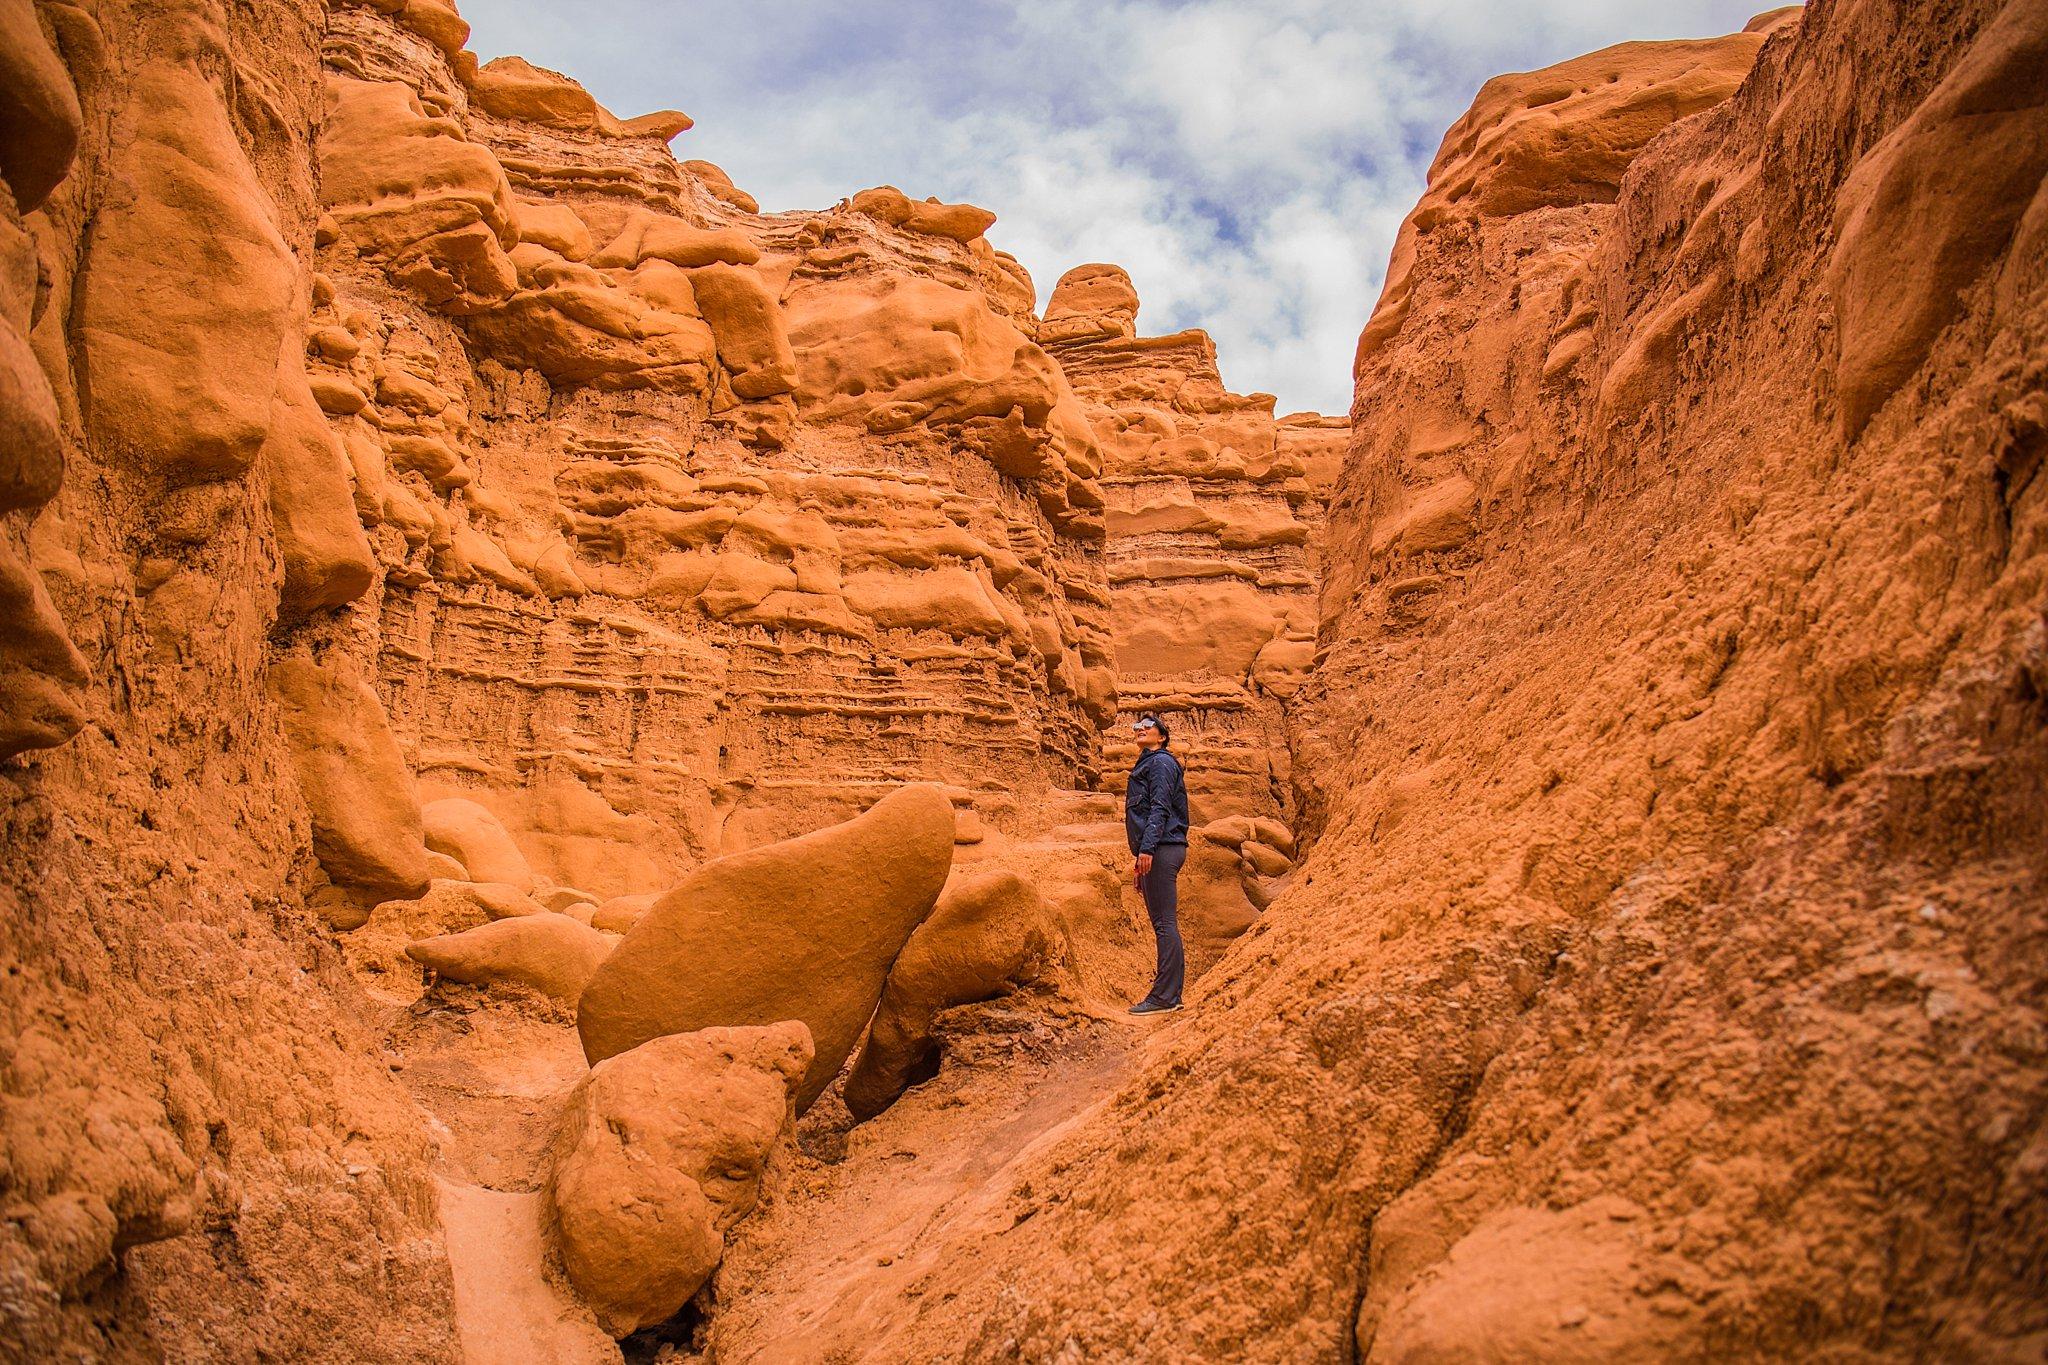 goblin valley, goblin valley state park, utah state park, southern utah, adventure, utah adventures